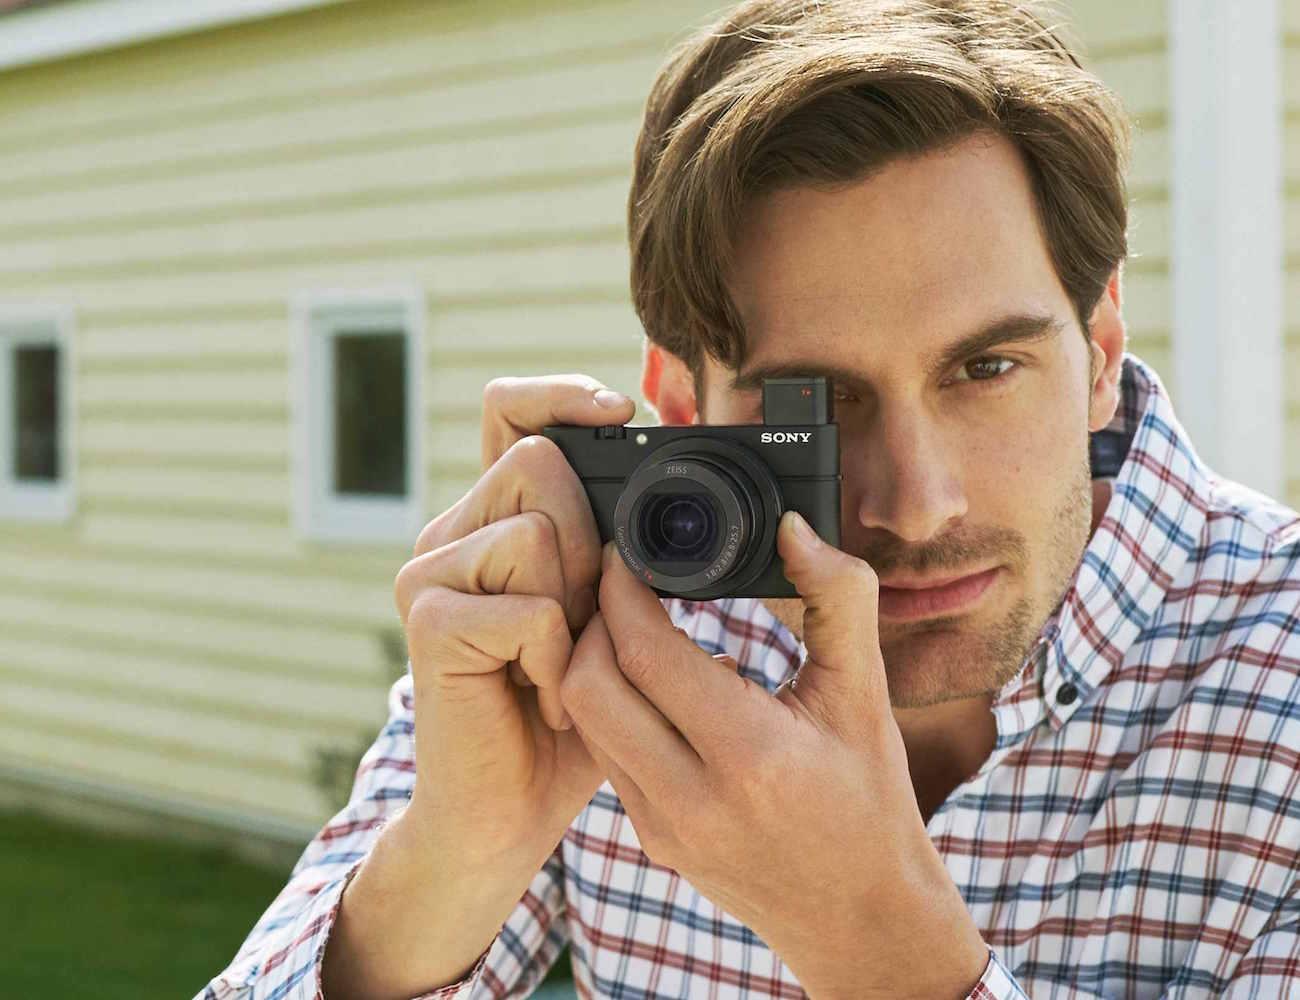 Sony RX100 IV Pocket Sized Camera